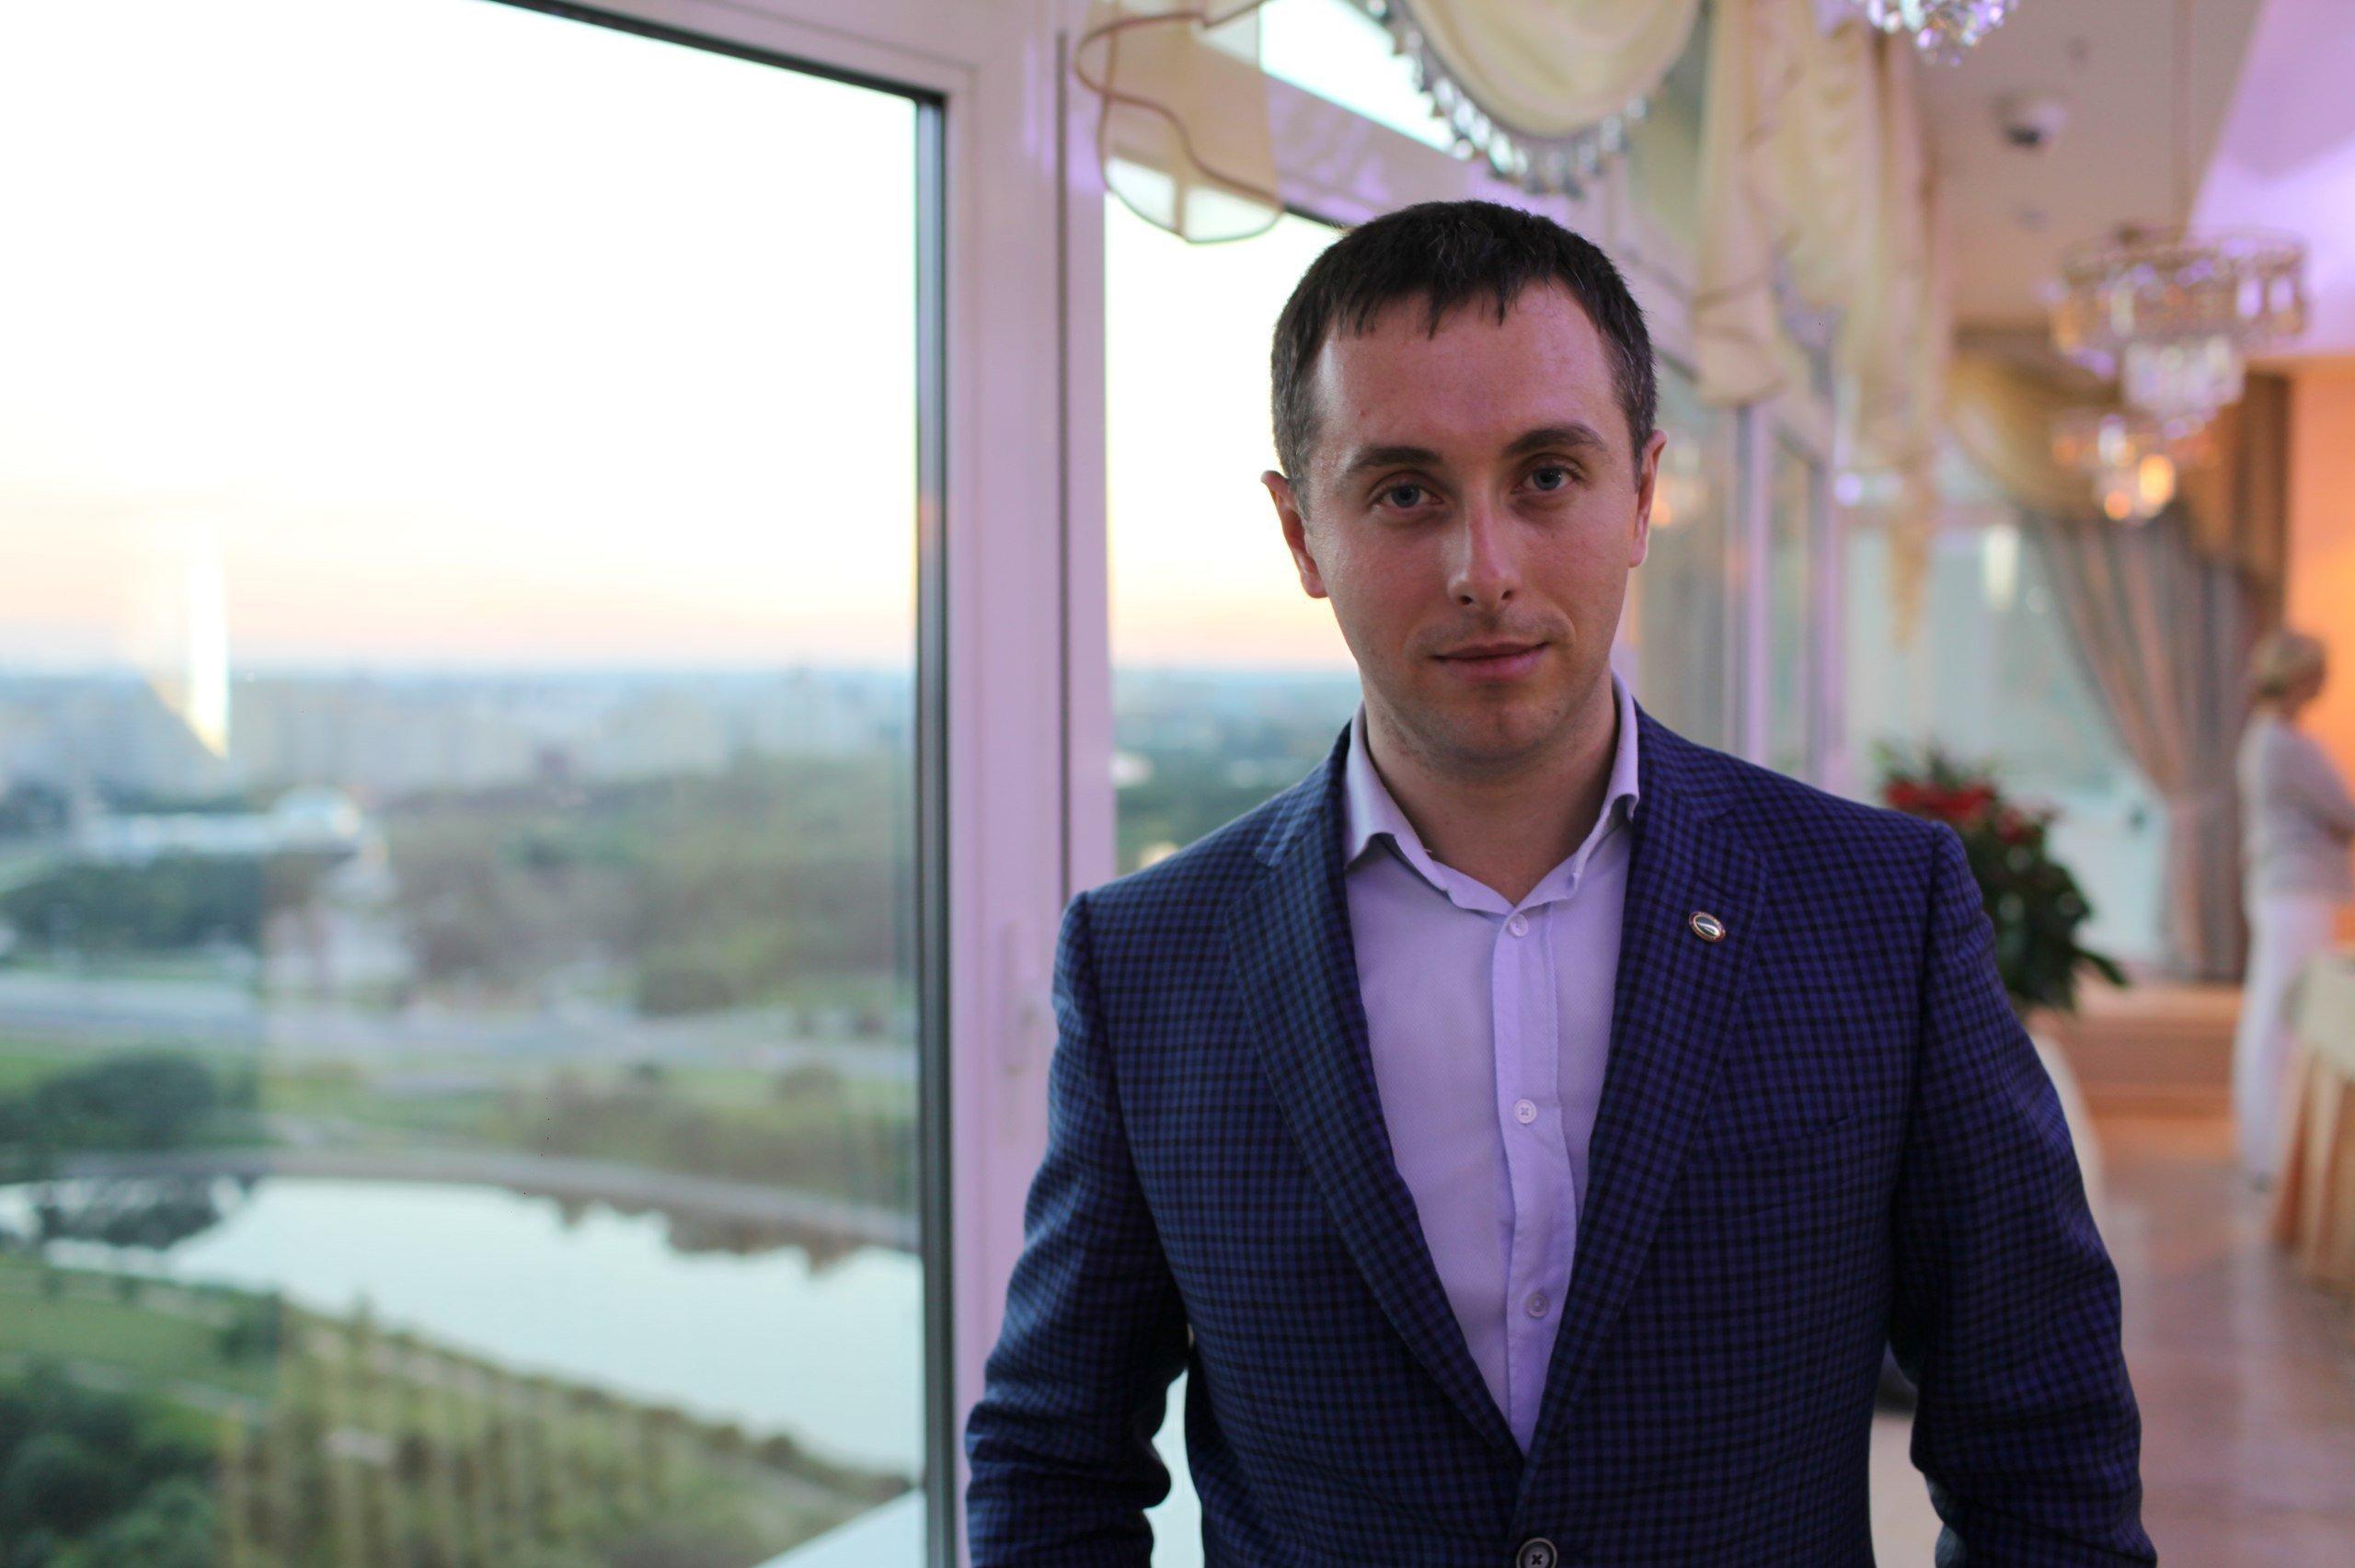 Sergey Semyonov